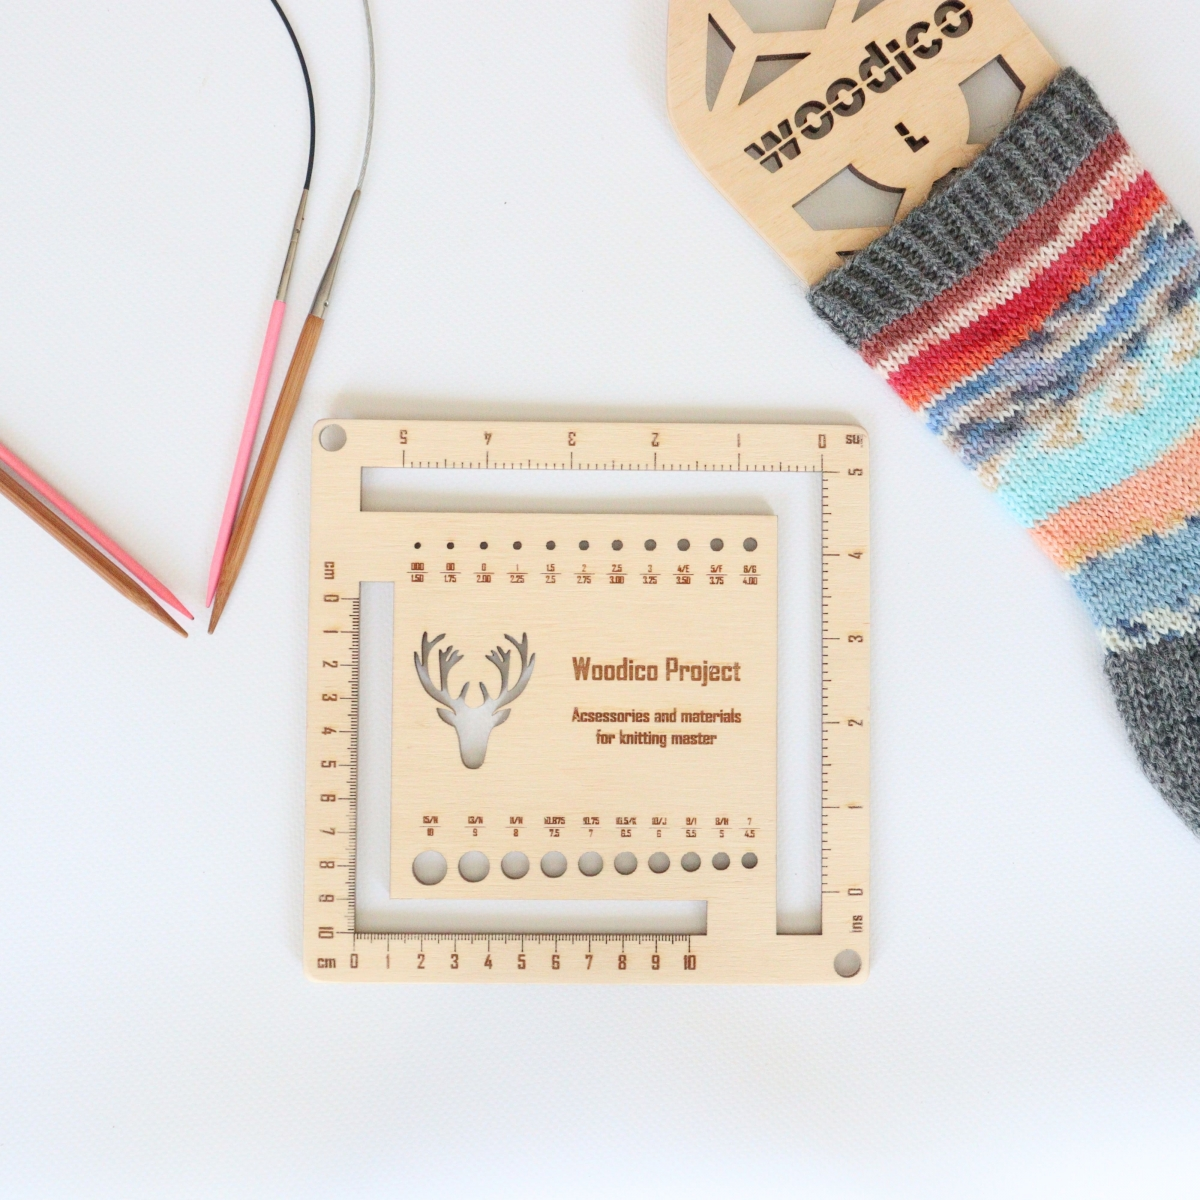 woodico.pro knitmetr 1 1200x1200 - Knitting needle gauge and ruler / Knitmetr